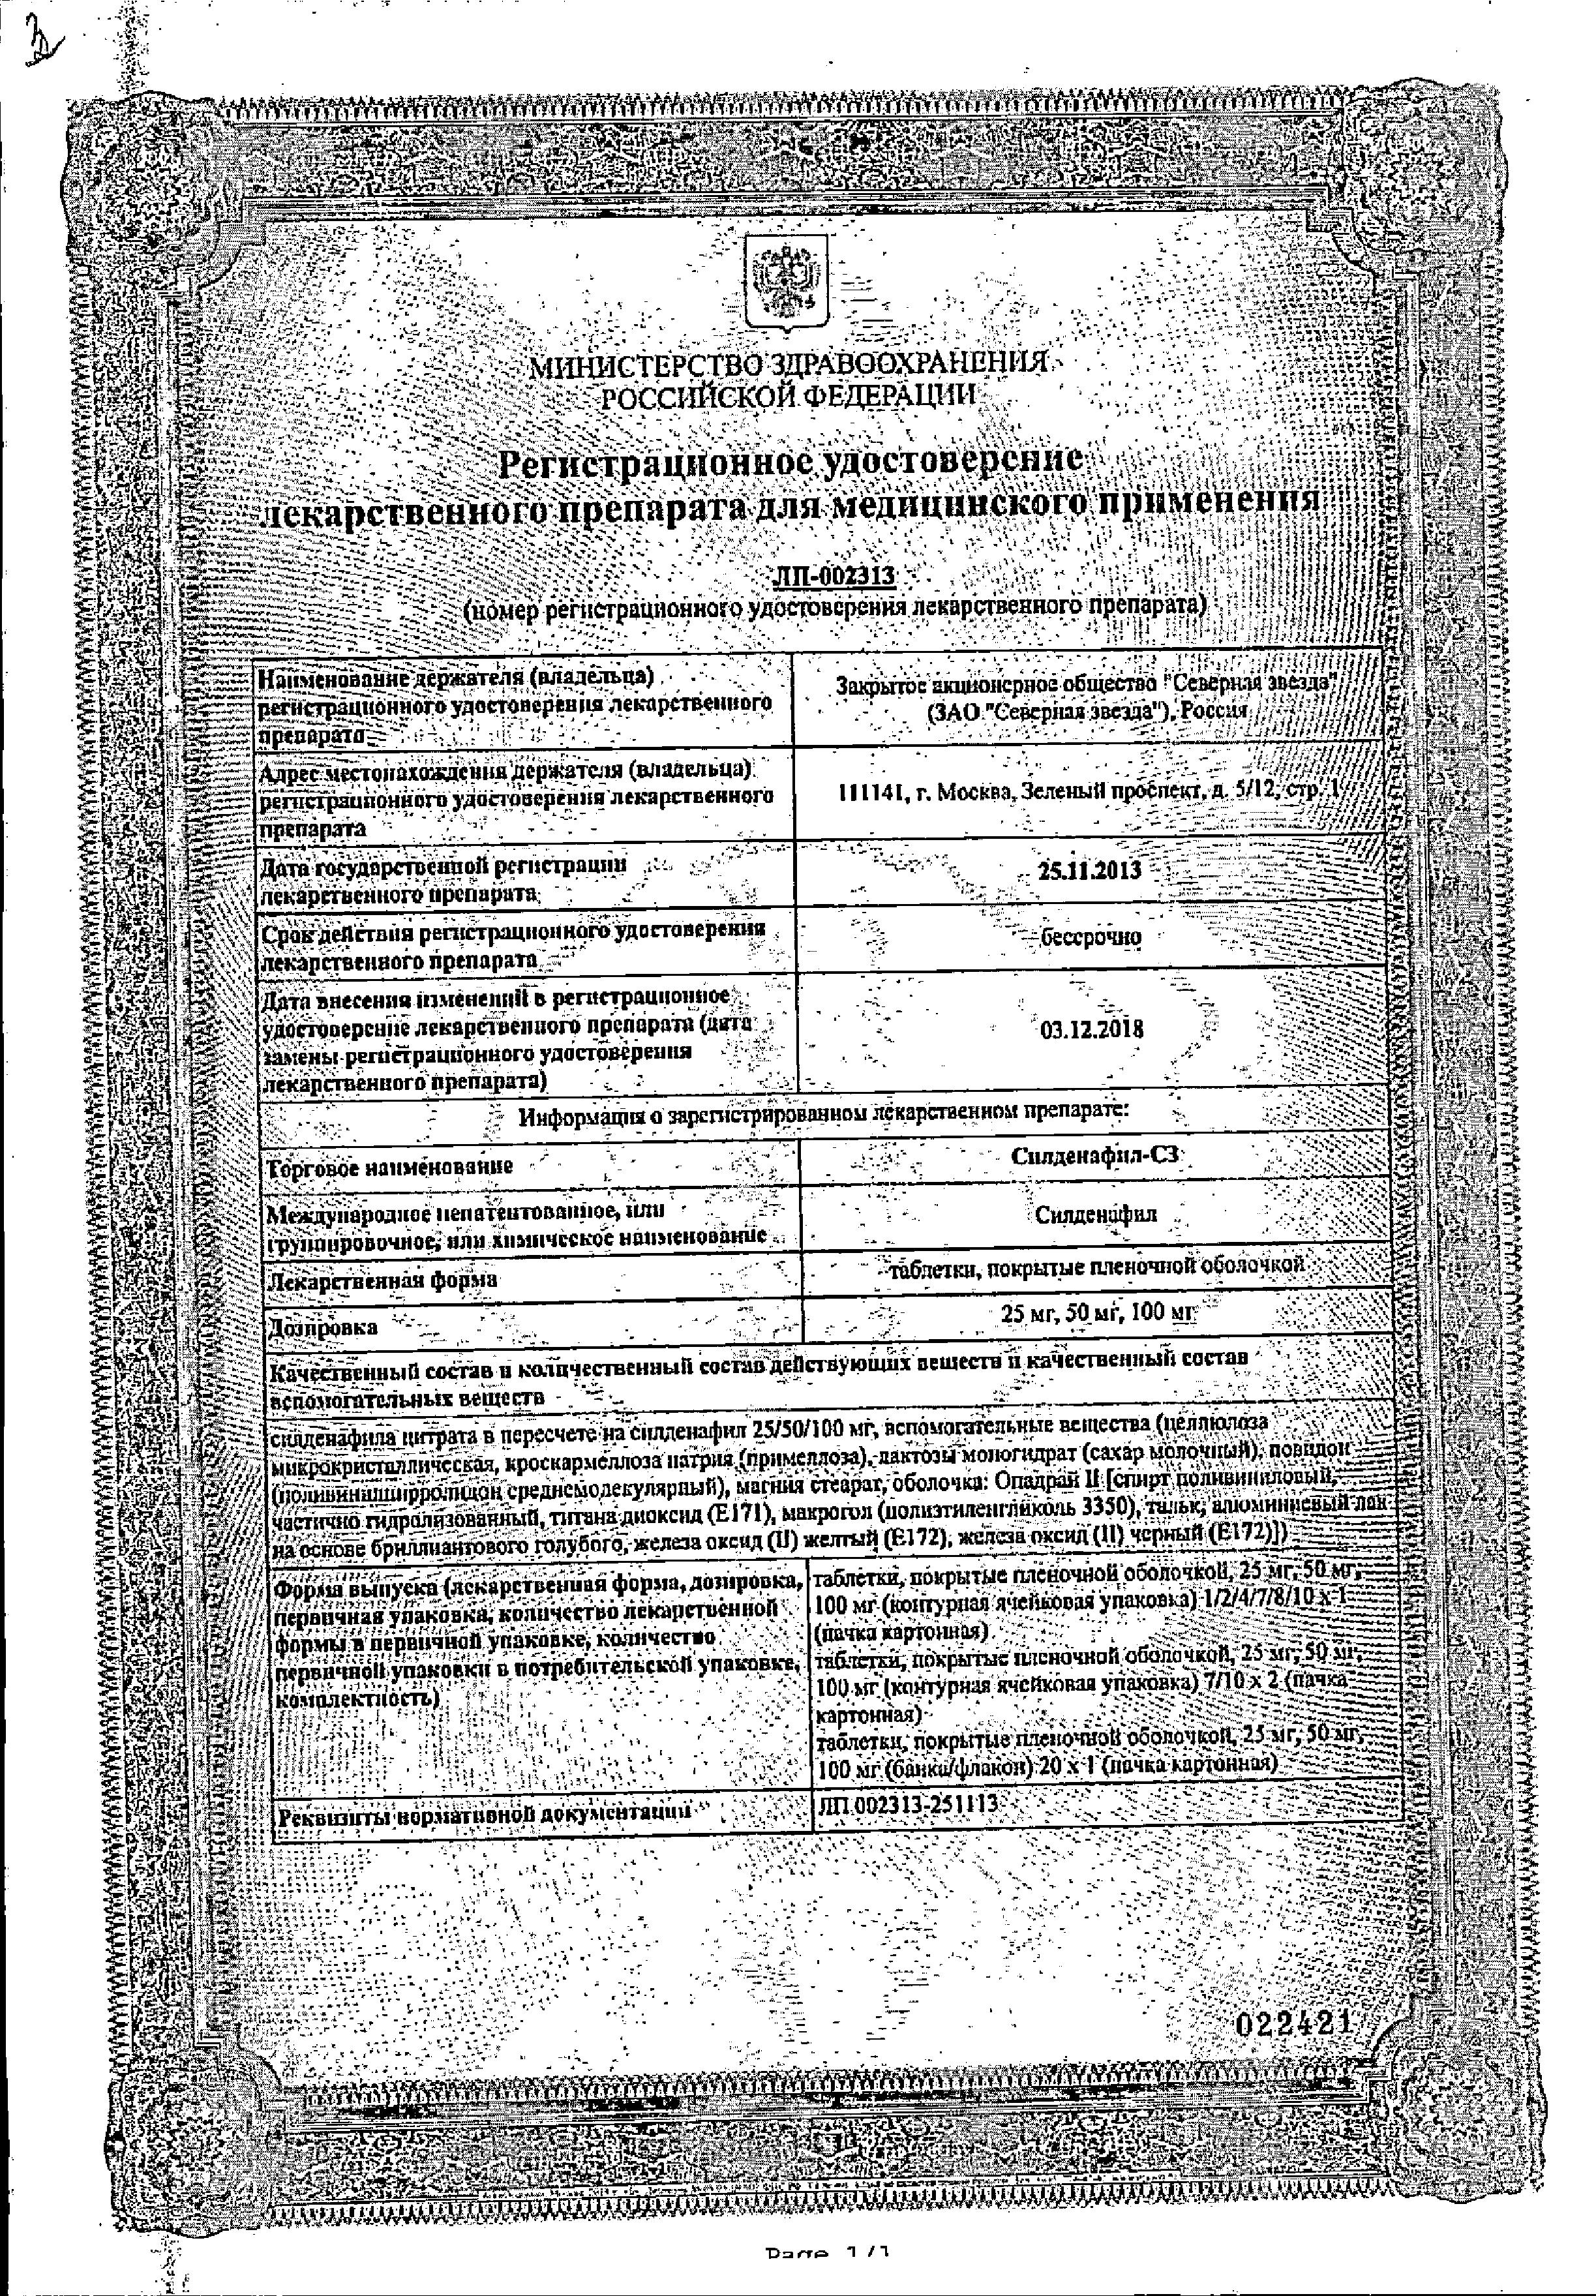 Силденафил-СЗ сертификат